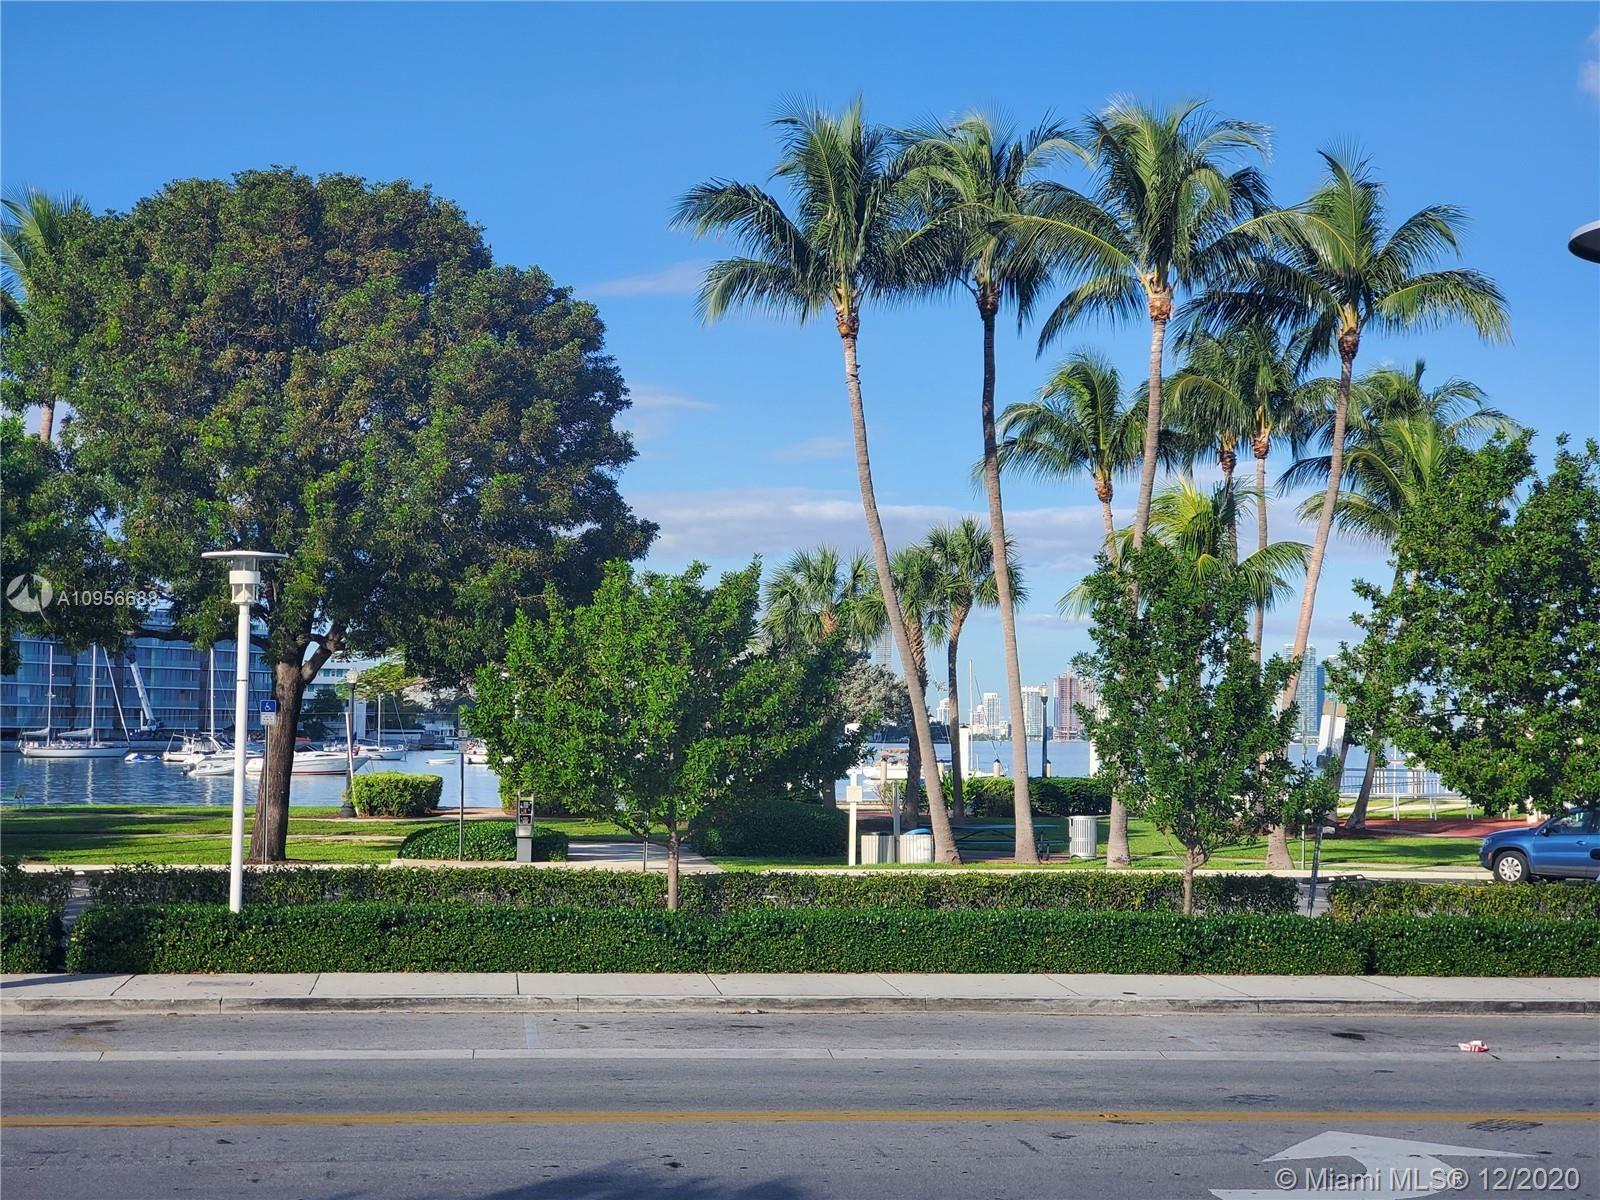 1771 Purdy Ave, Miami Beach, FL 33139 - #: A10956688